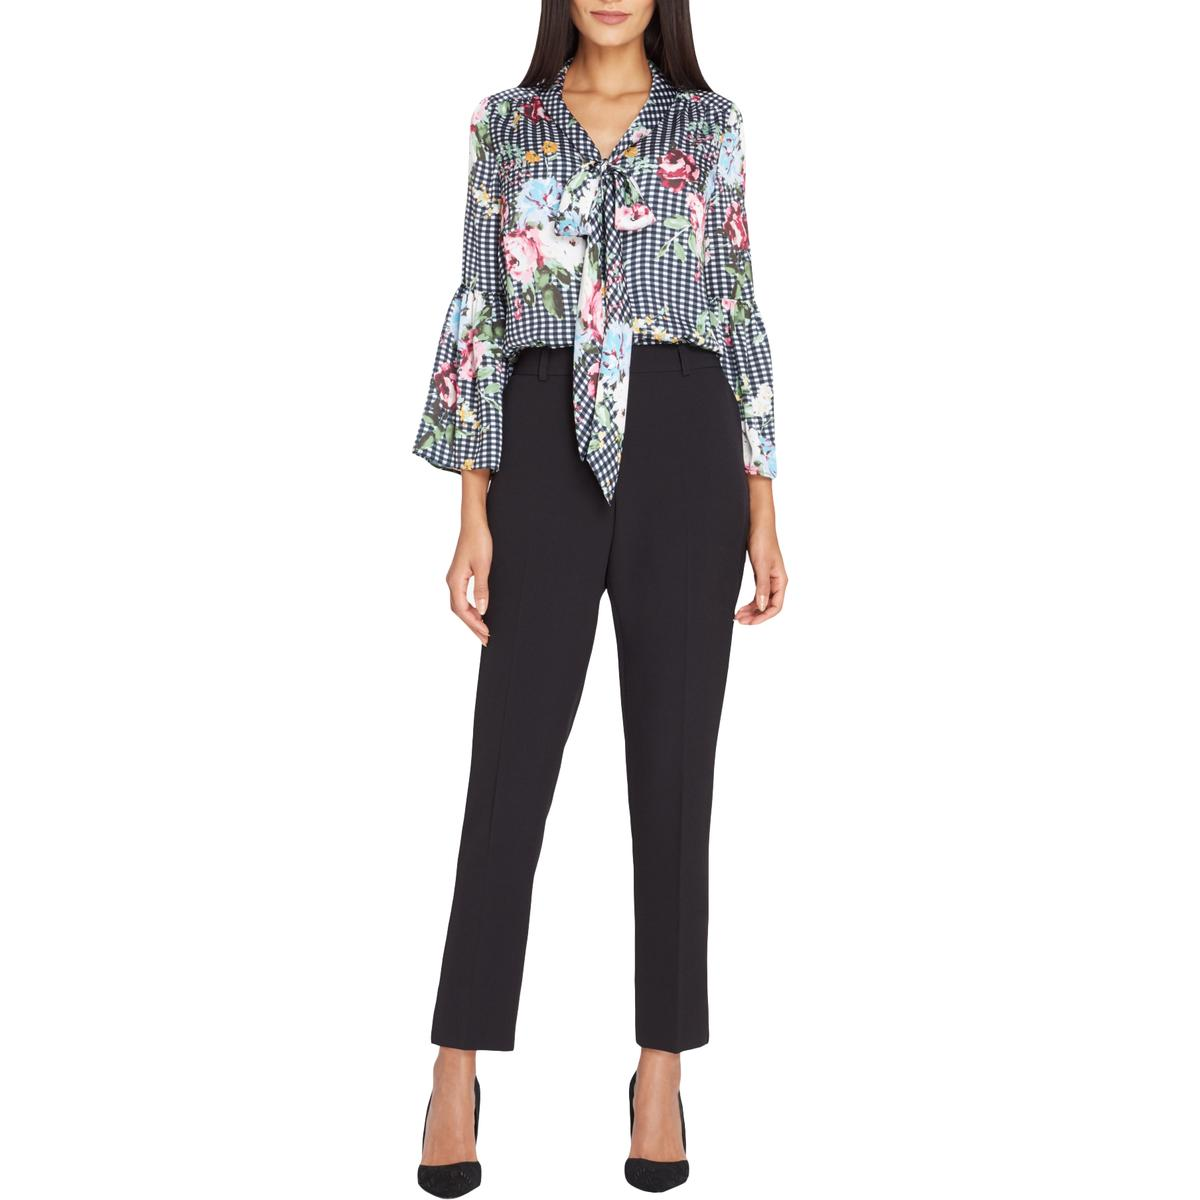 588108e827126 Details about Tahari ASL Womens Floral Print Button-Down Top Shirt Petites  BHFO 0869